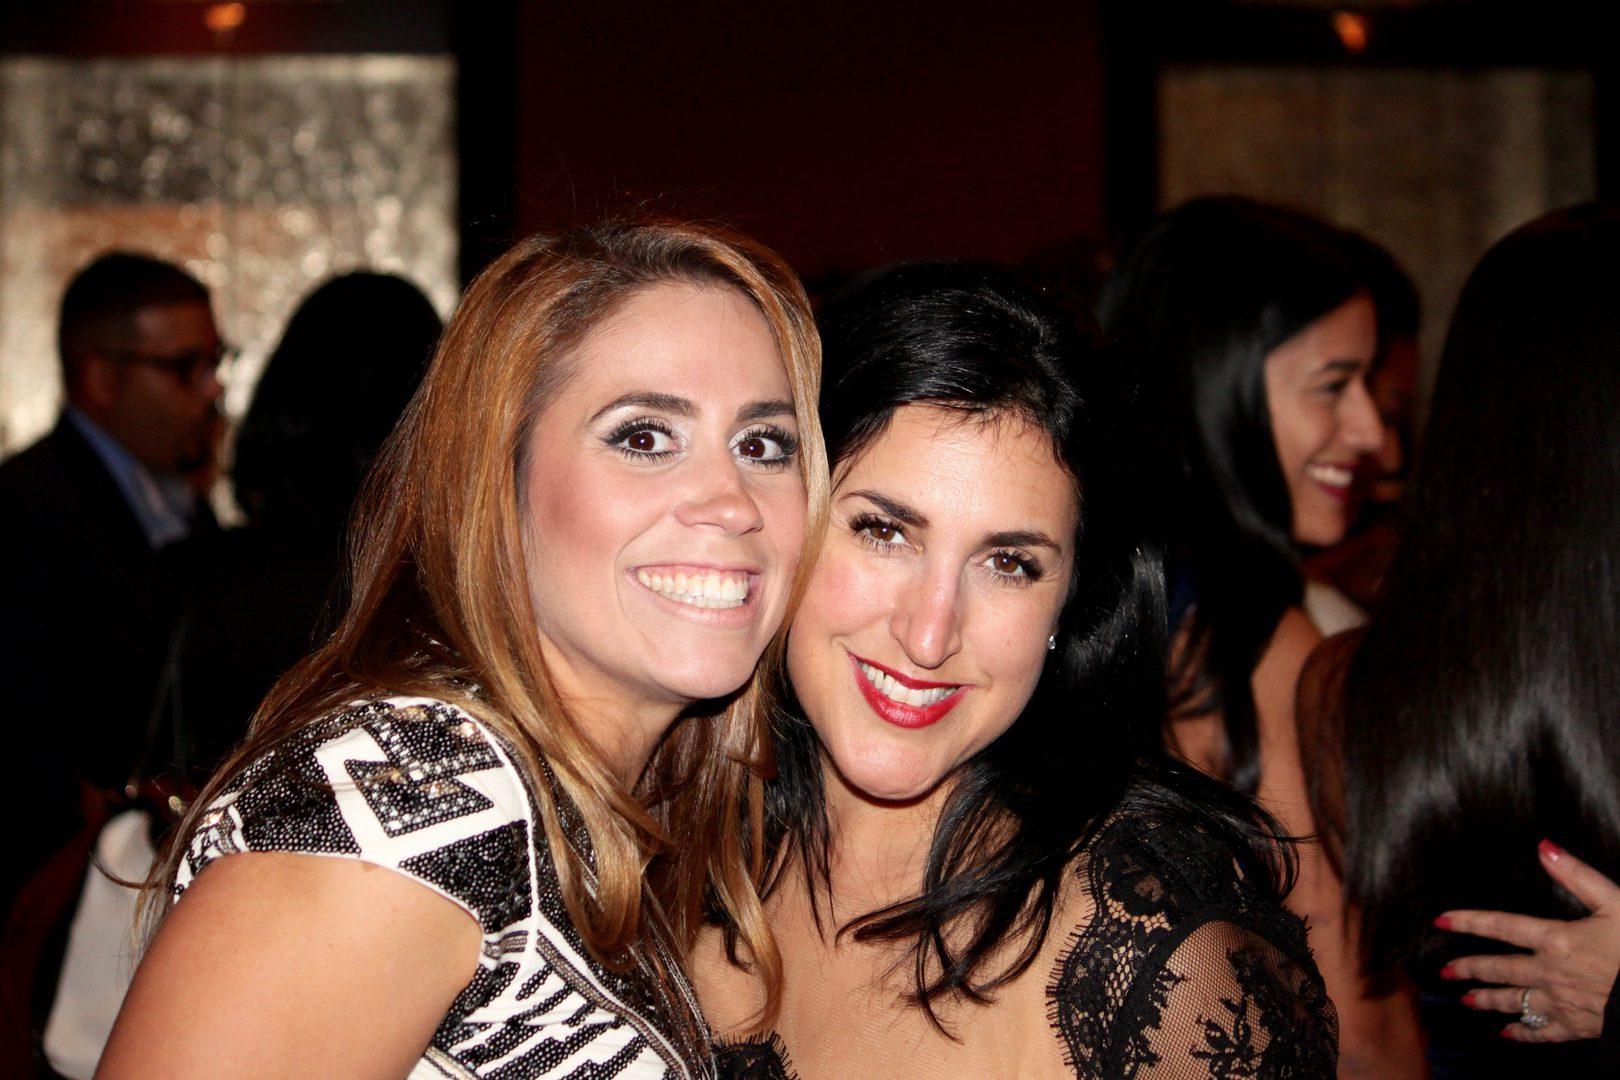 Two happy women smiling